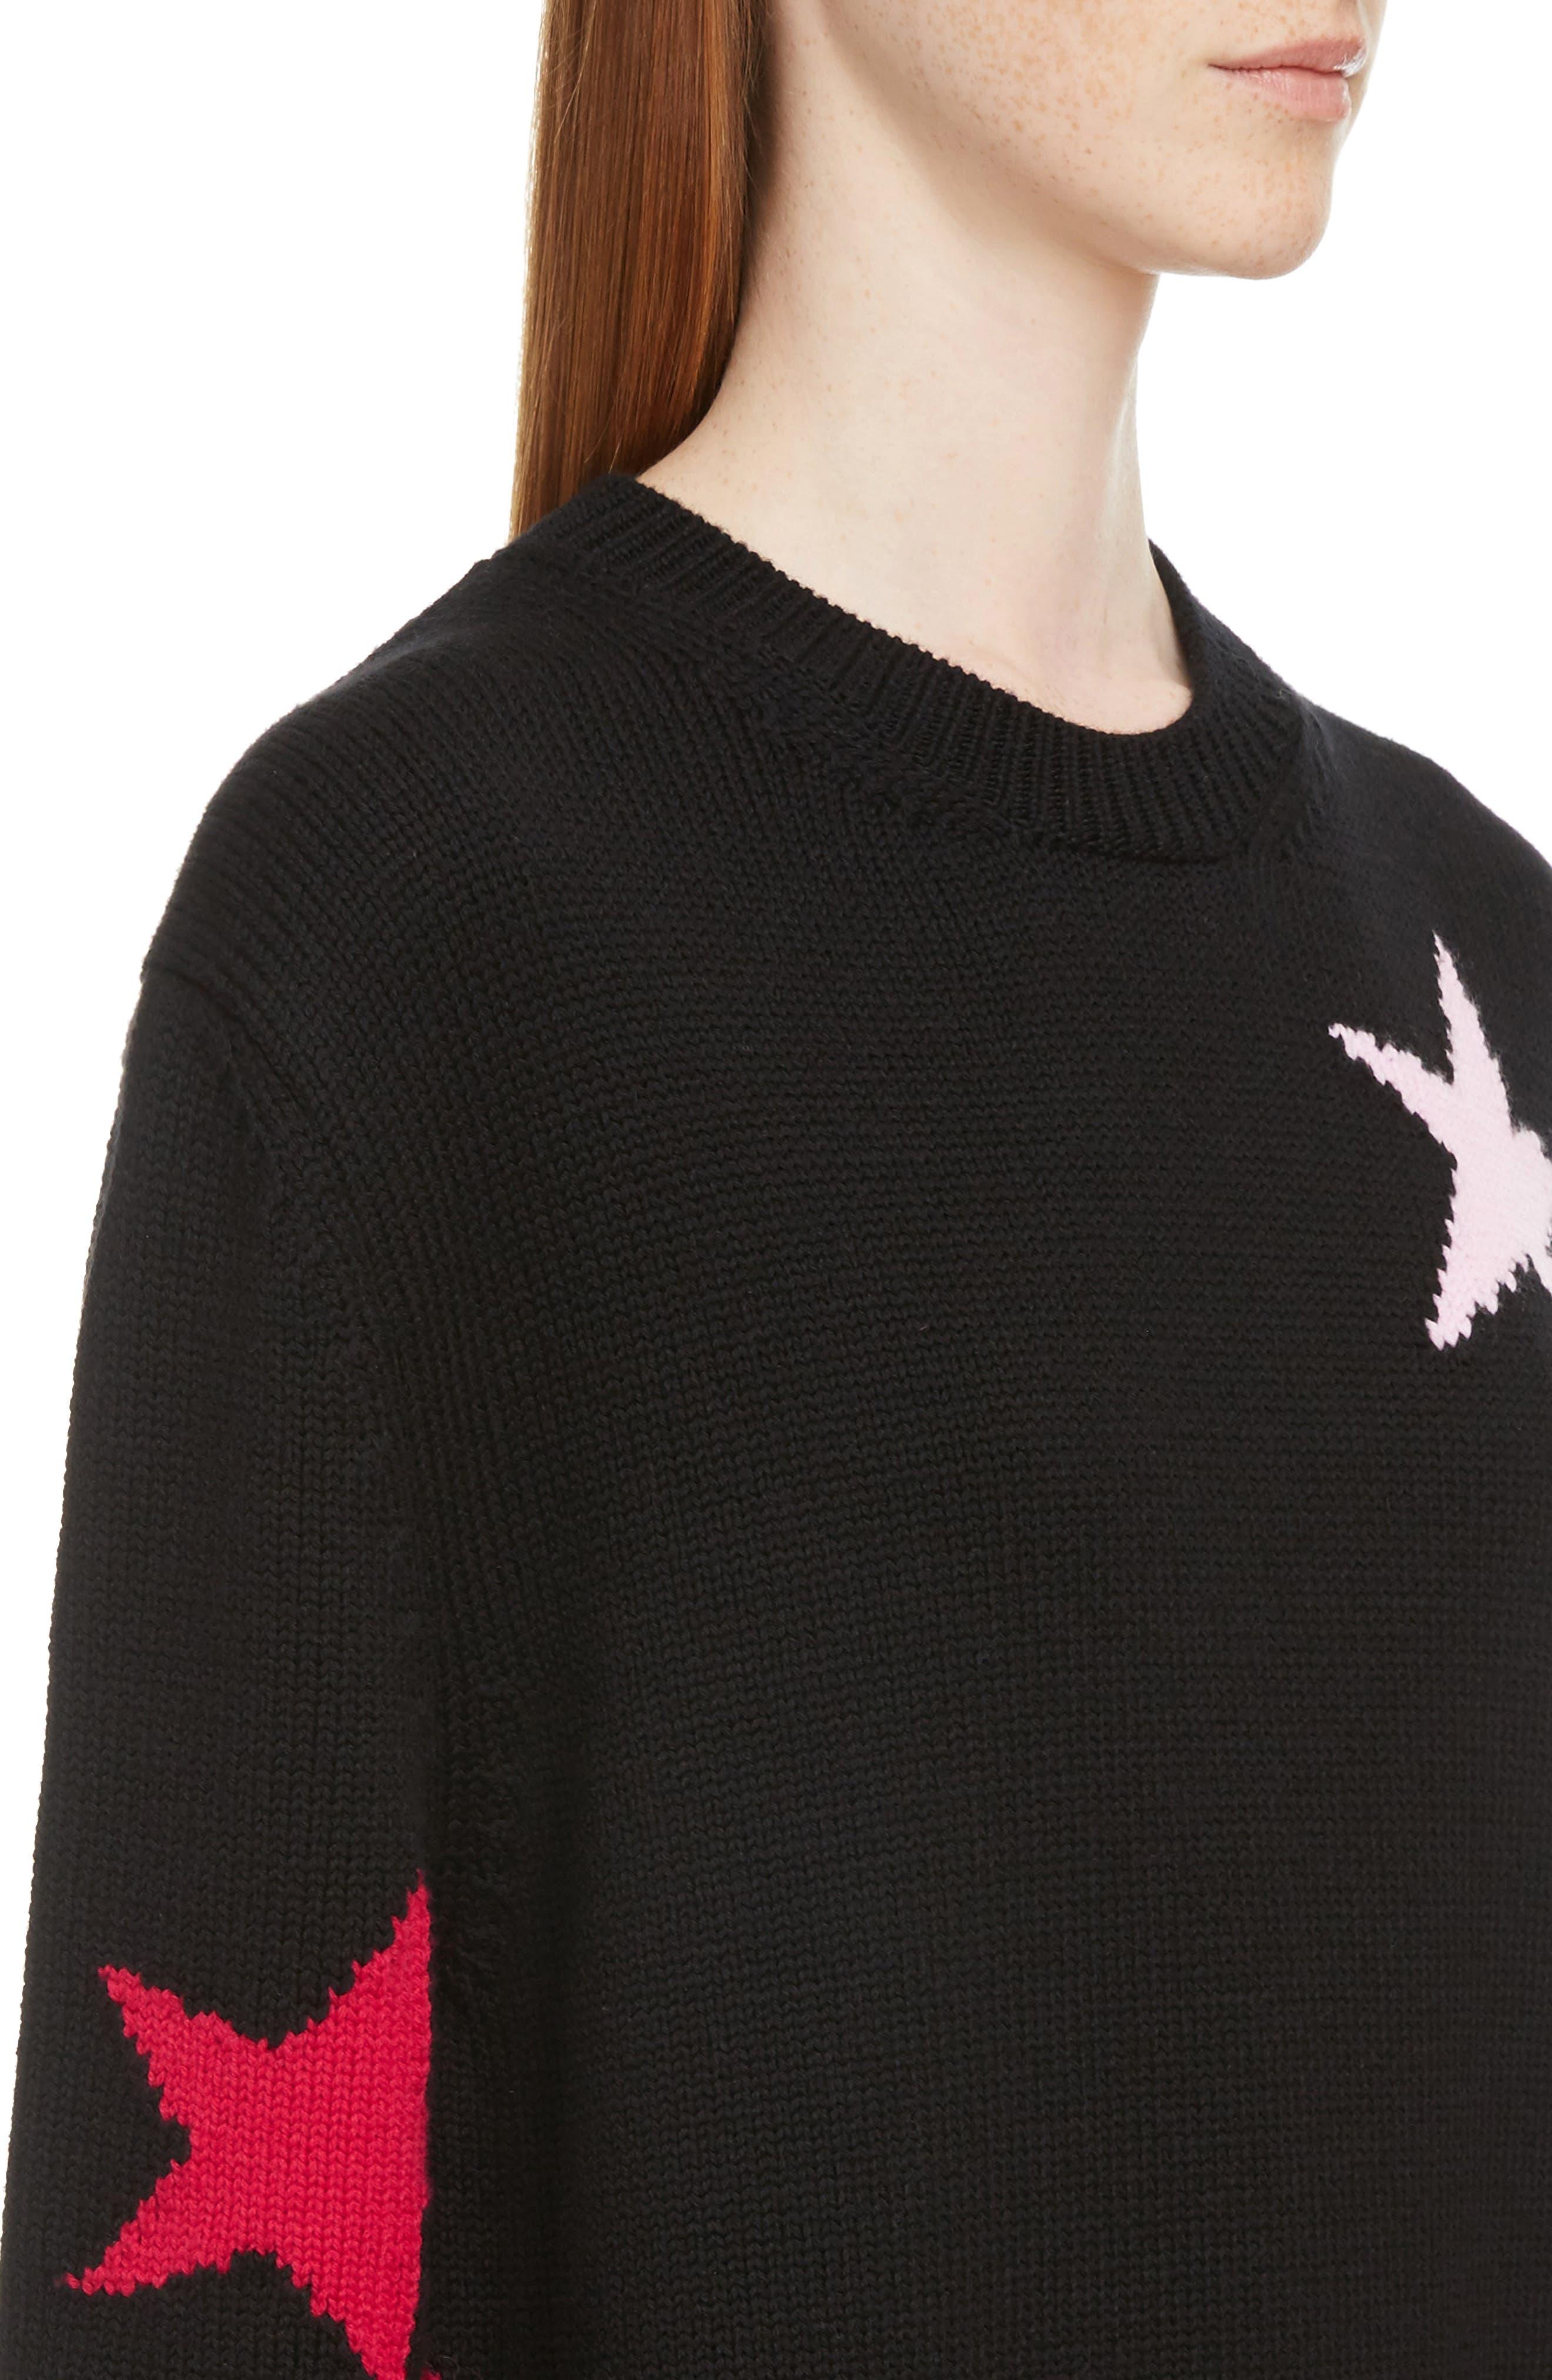 Star Cutout Wool Sweater,                             Alternate thumbnail 4, color,                             Black